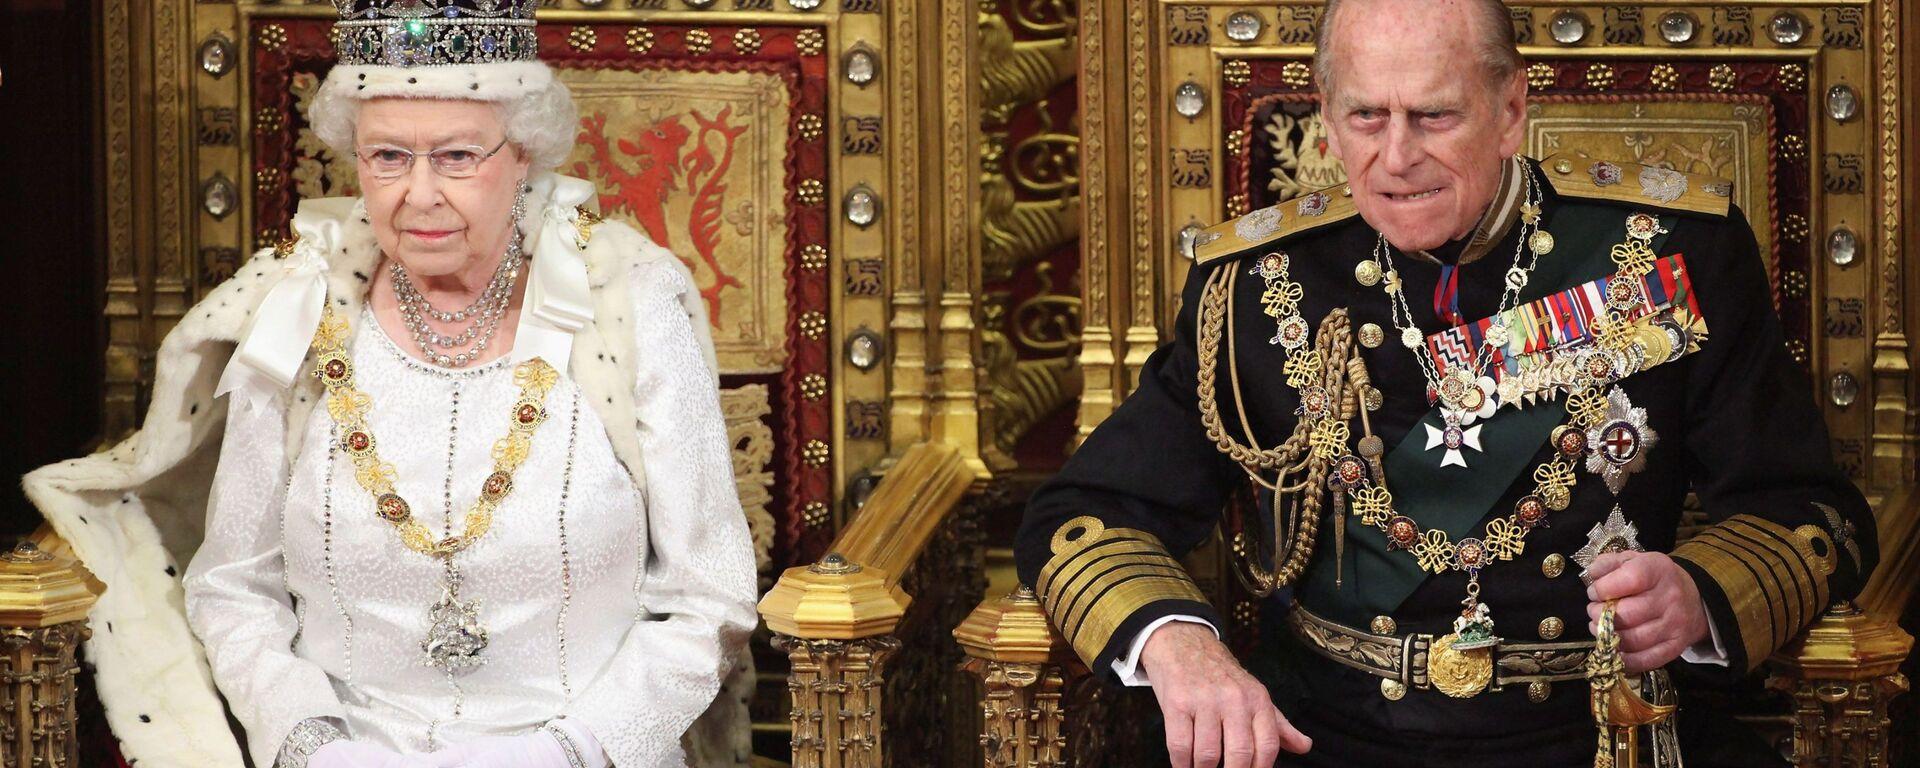 La regina Elisabetta e il principe Filippo - Sputnik Italia, 1920, 10.04.2021